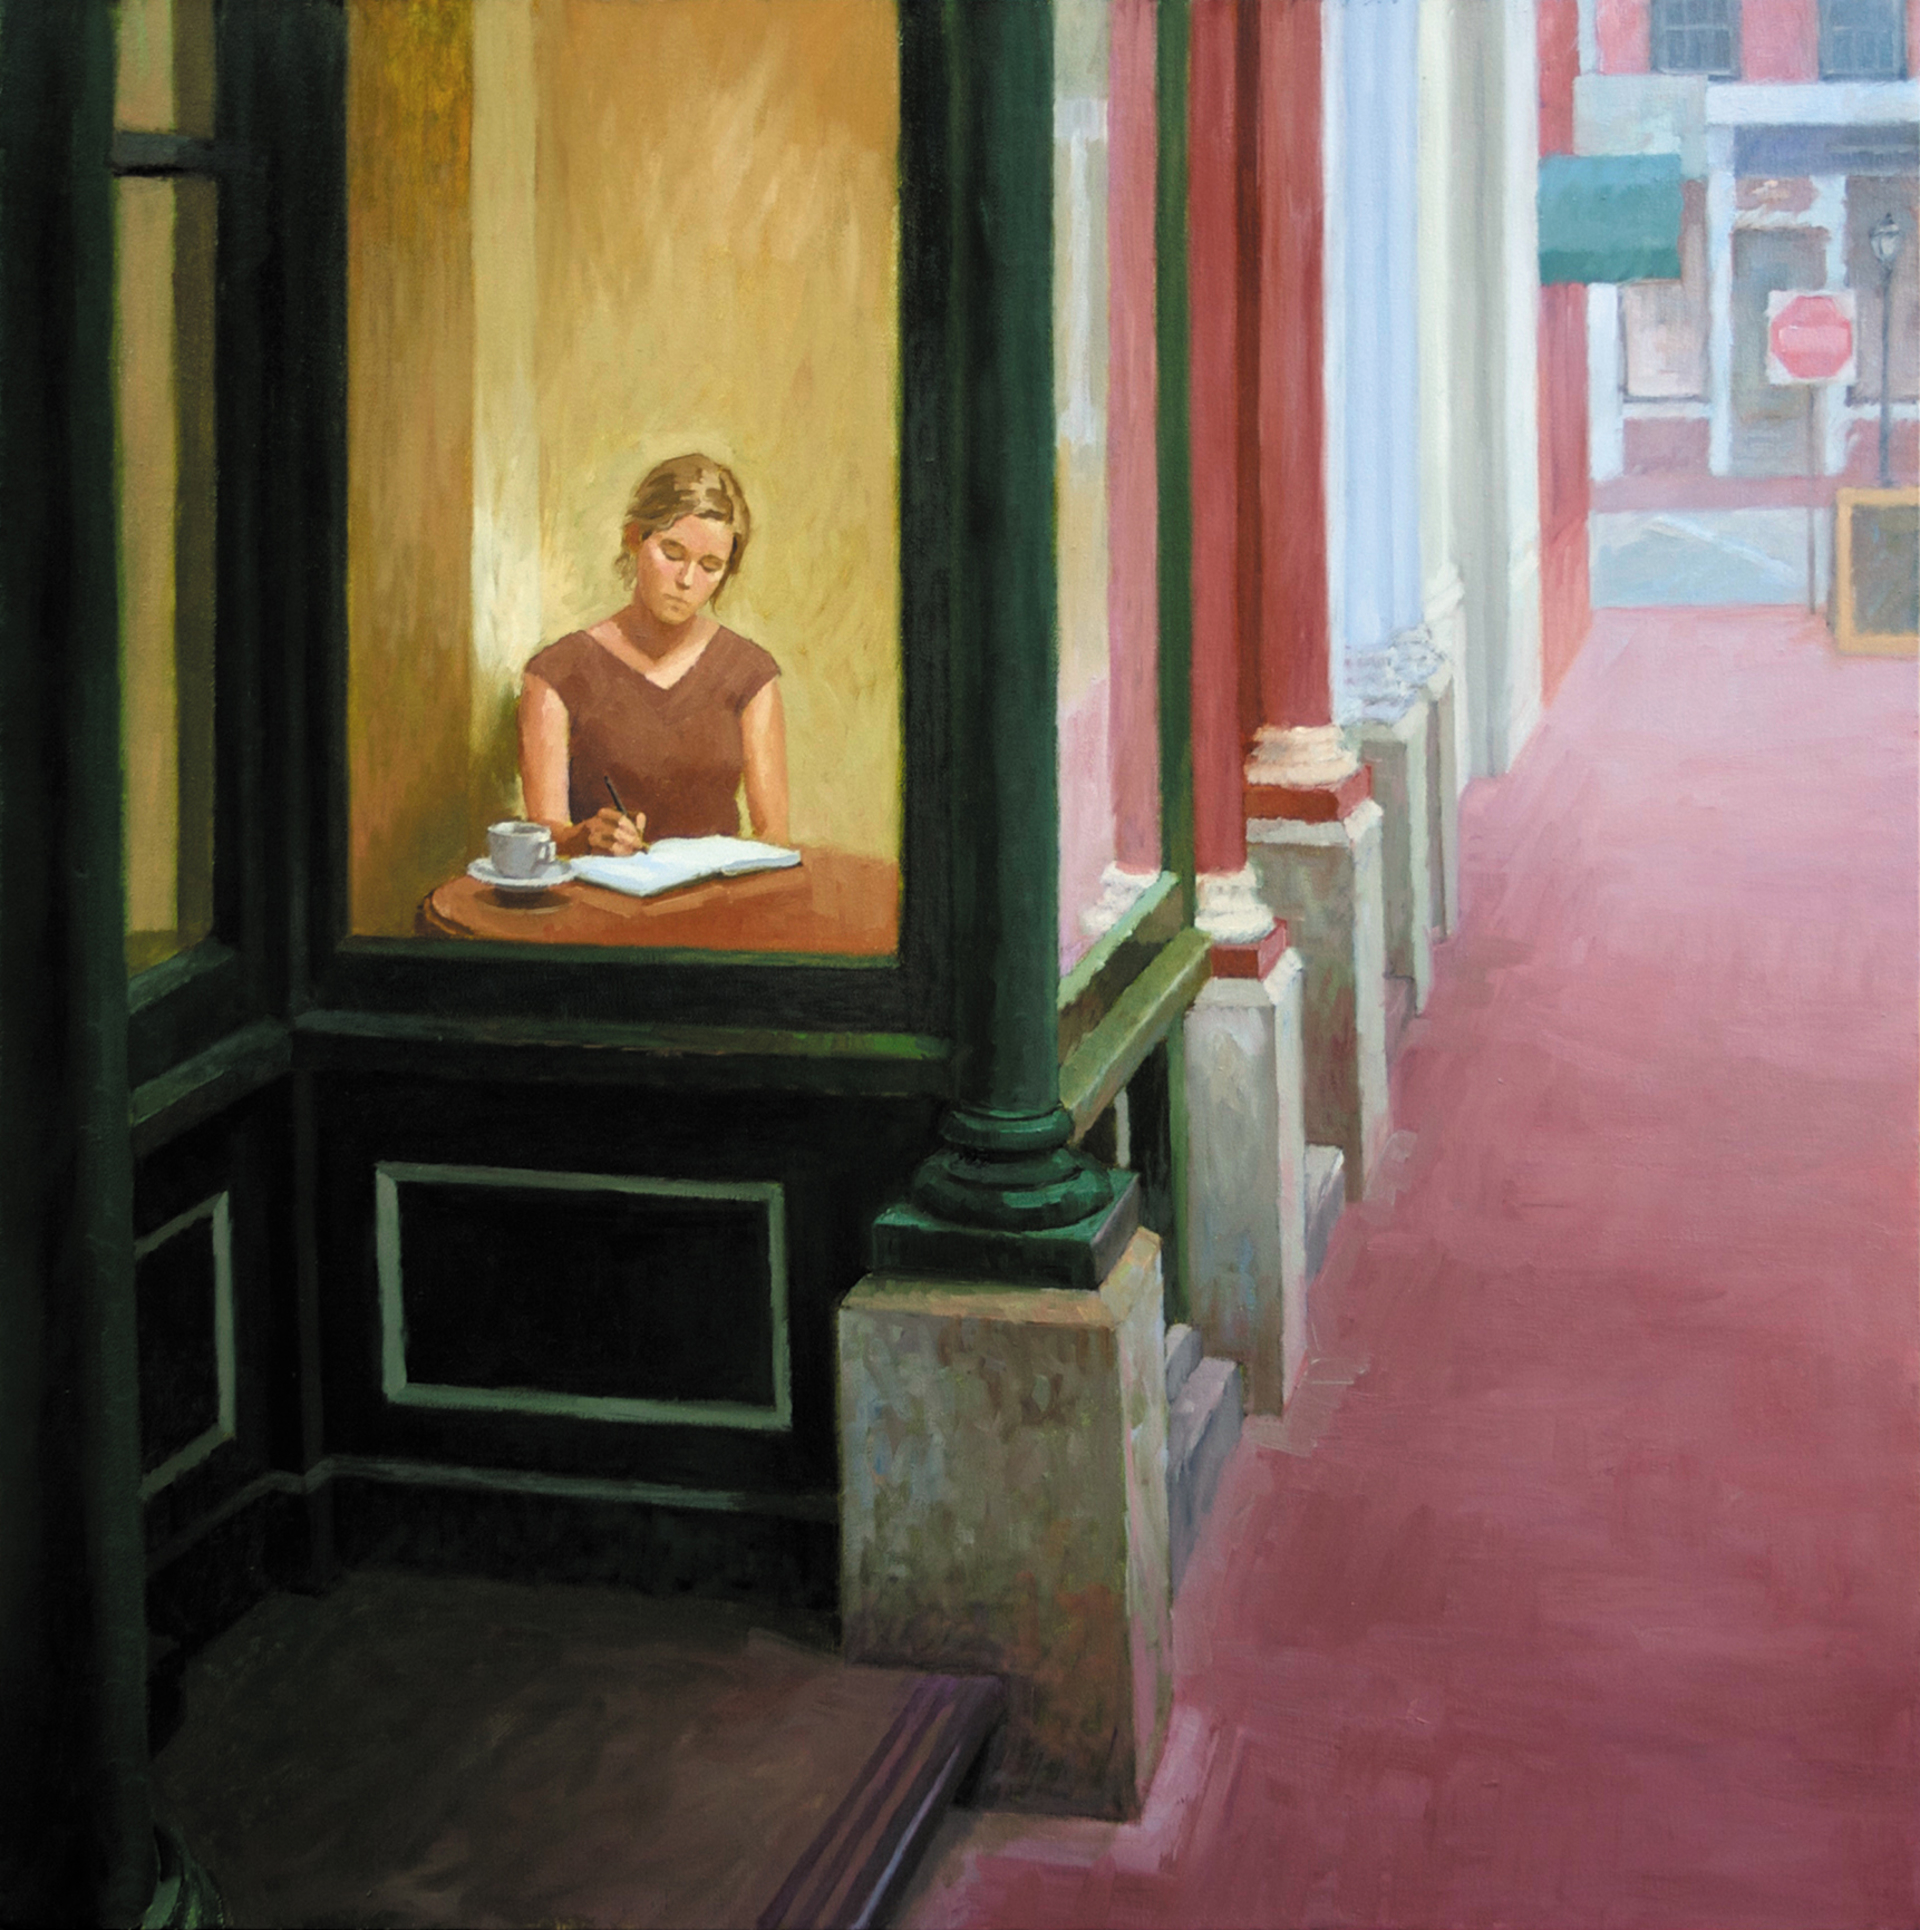 Notebook by Paul Schulenburg